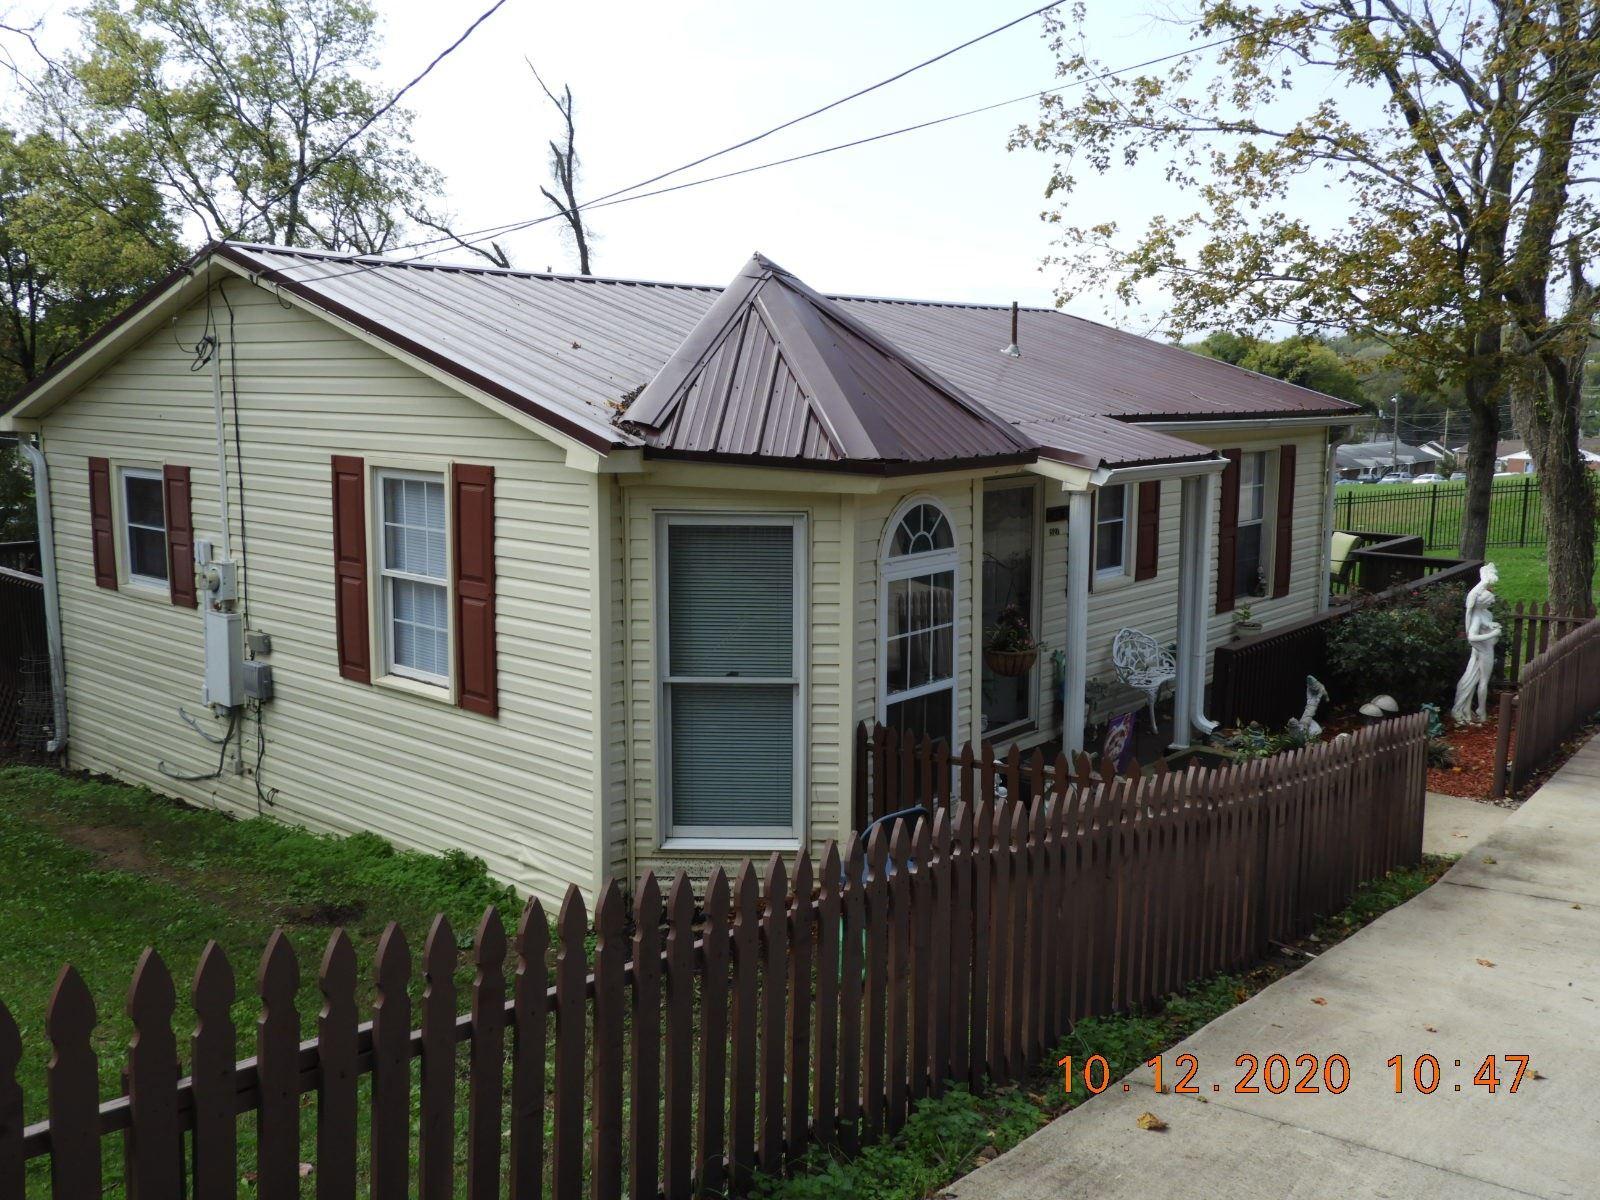 Photo of 527 E Grigsby St, Pulaski, TN 38478 (MLS # 2197636)